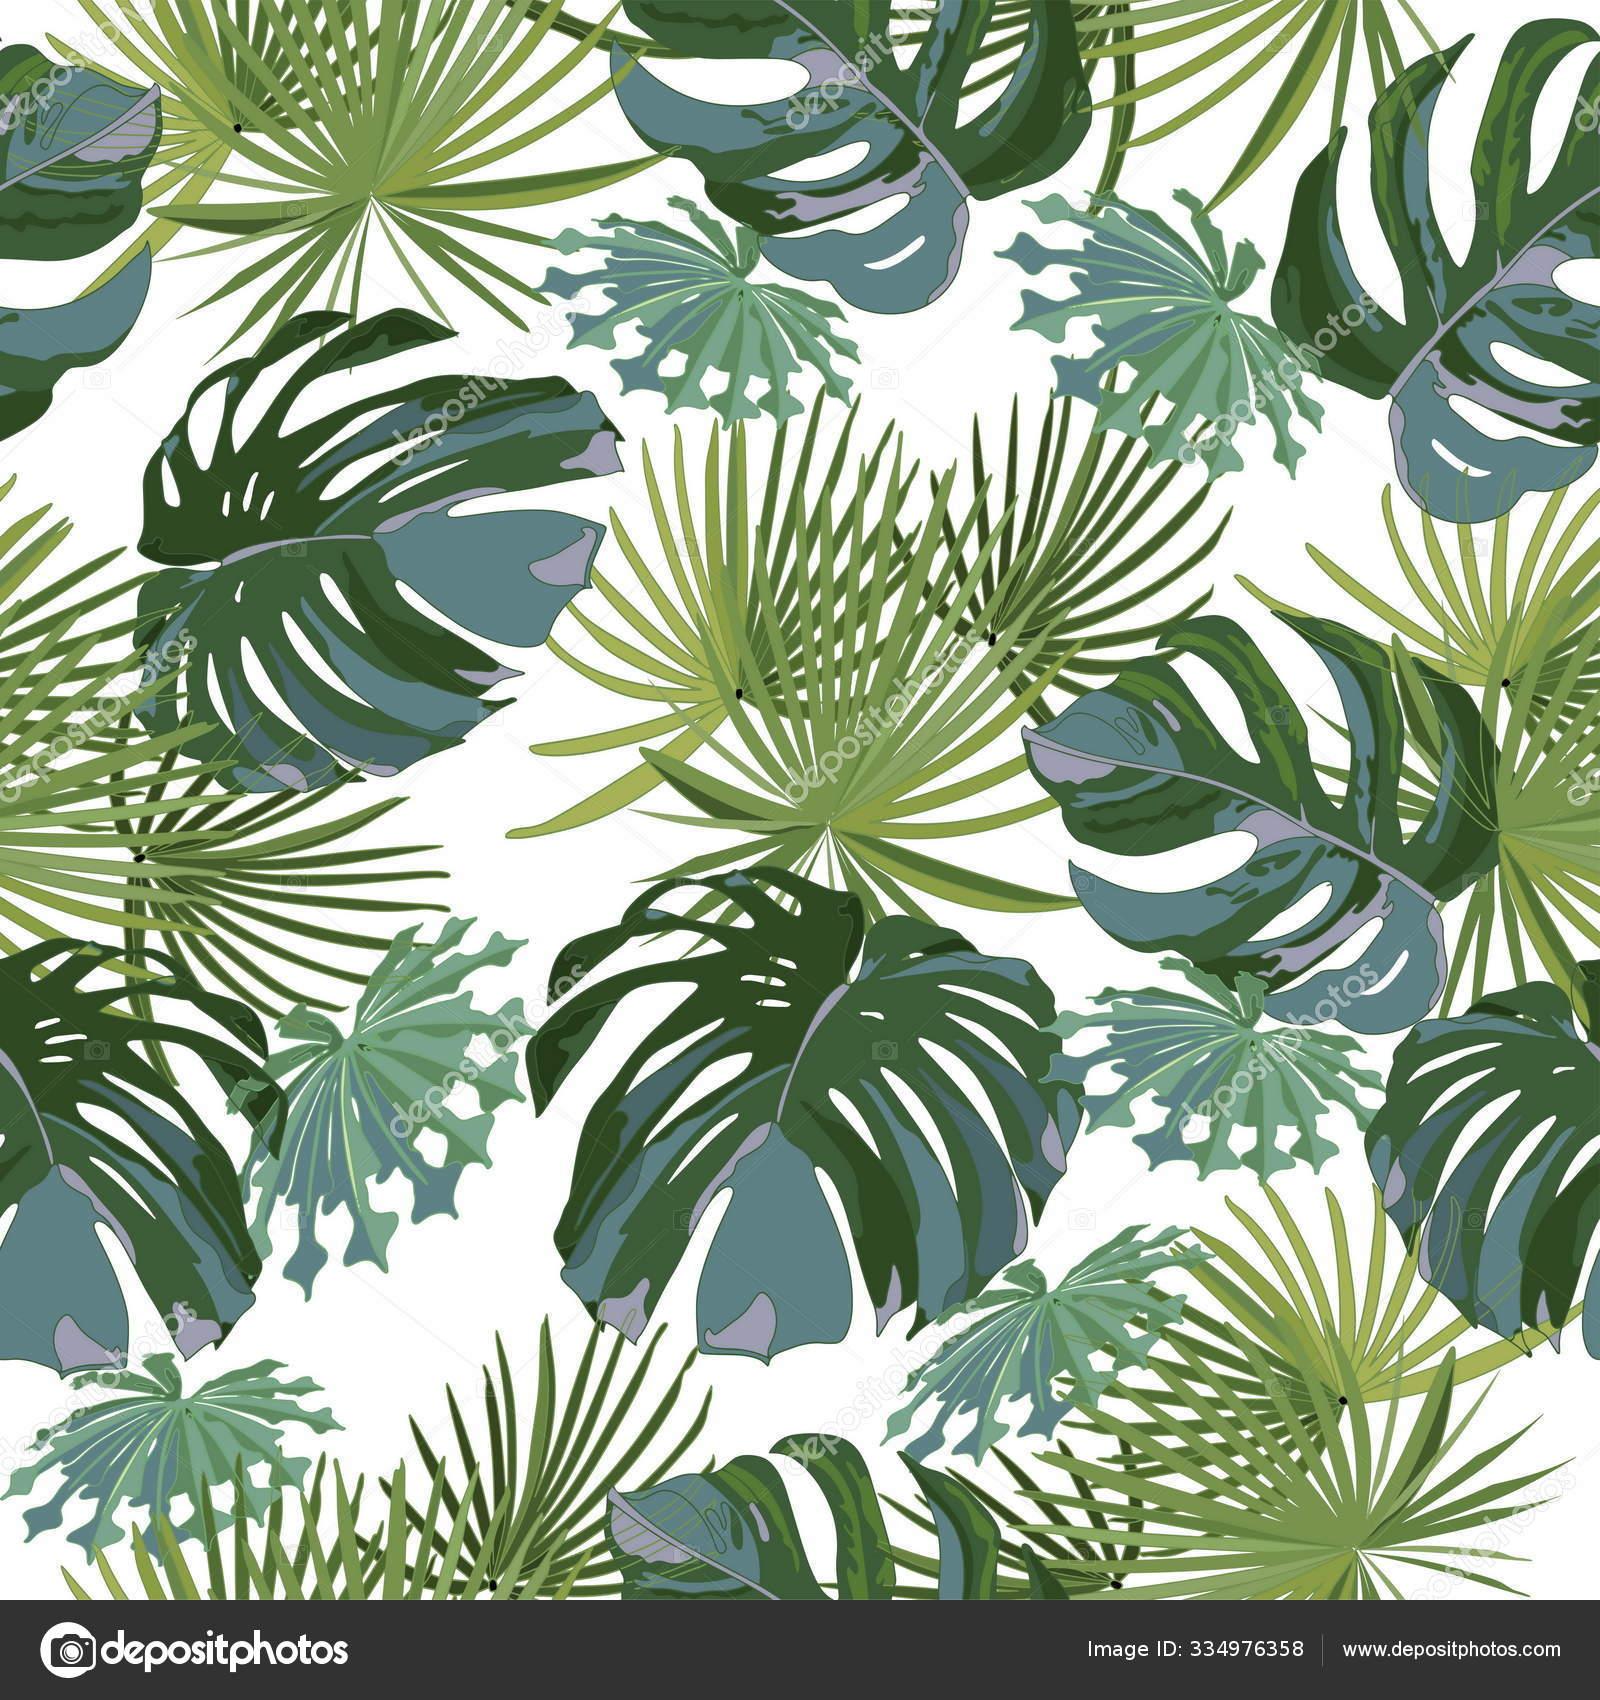 depositphotos 334976358 stock illustration exotic tropical palm leaves monstera